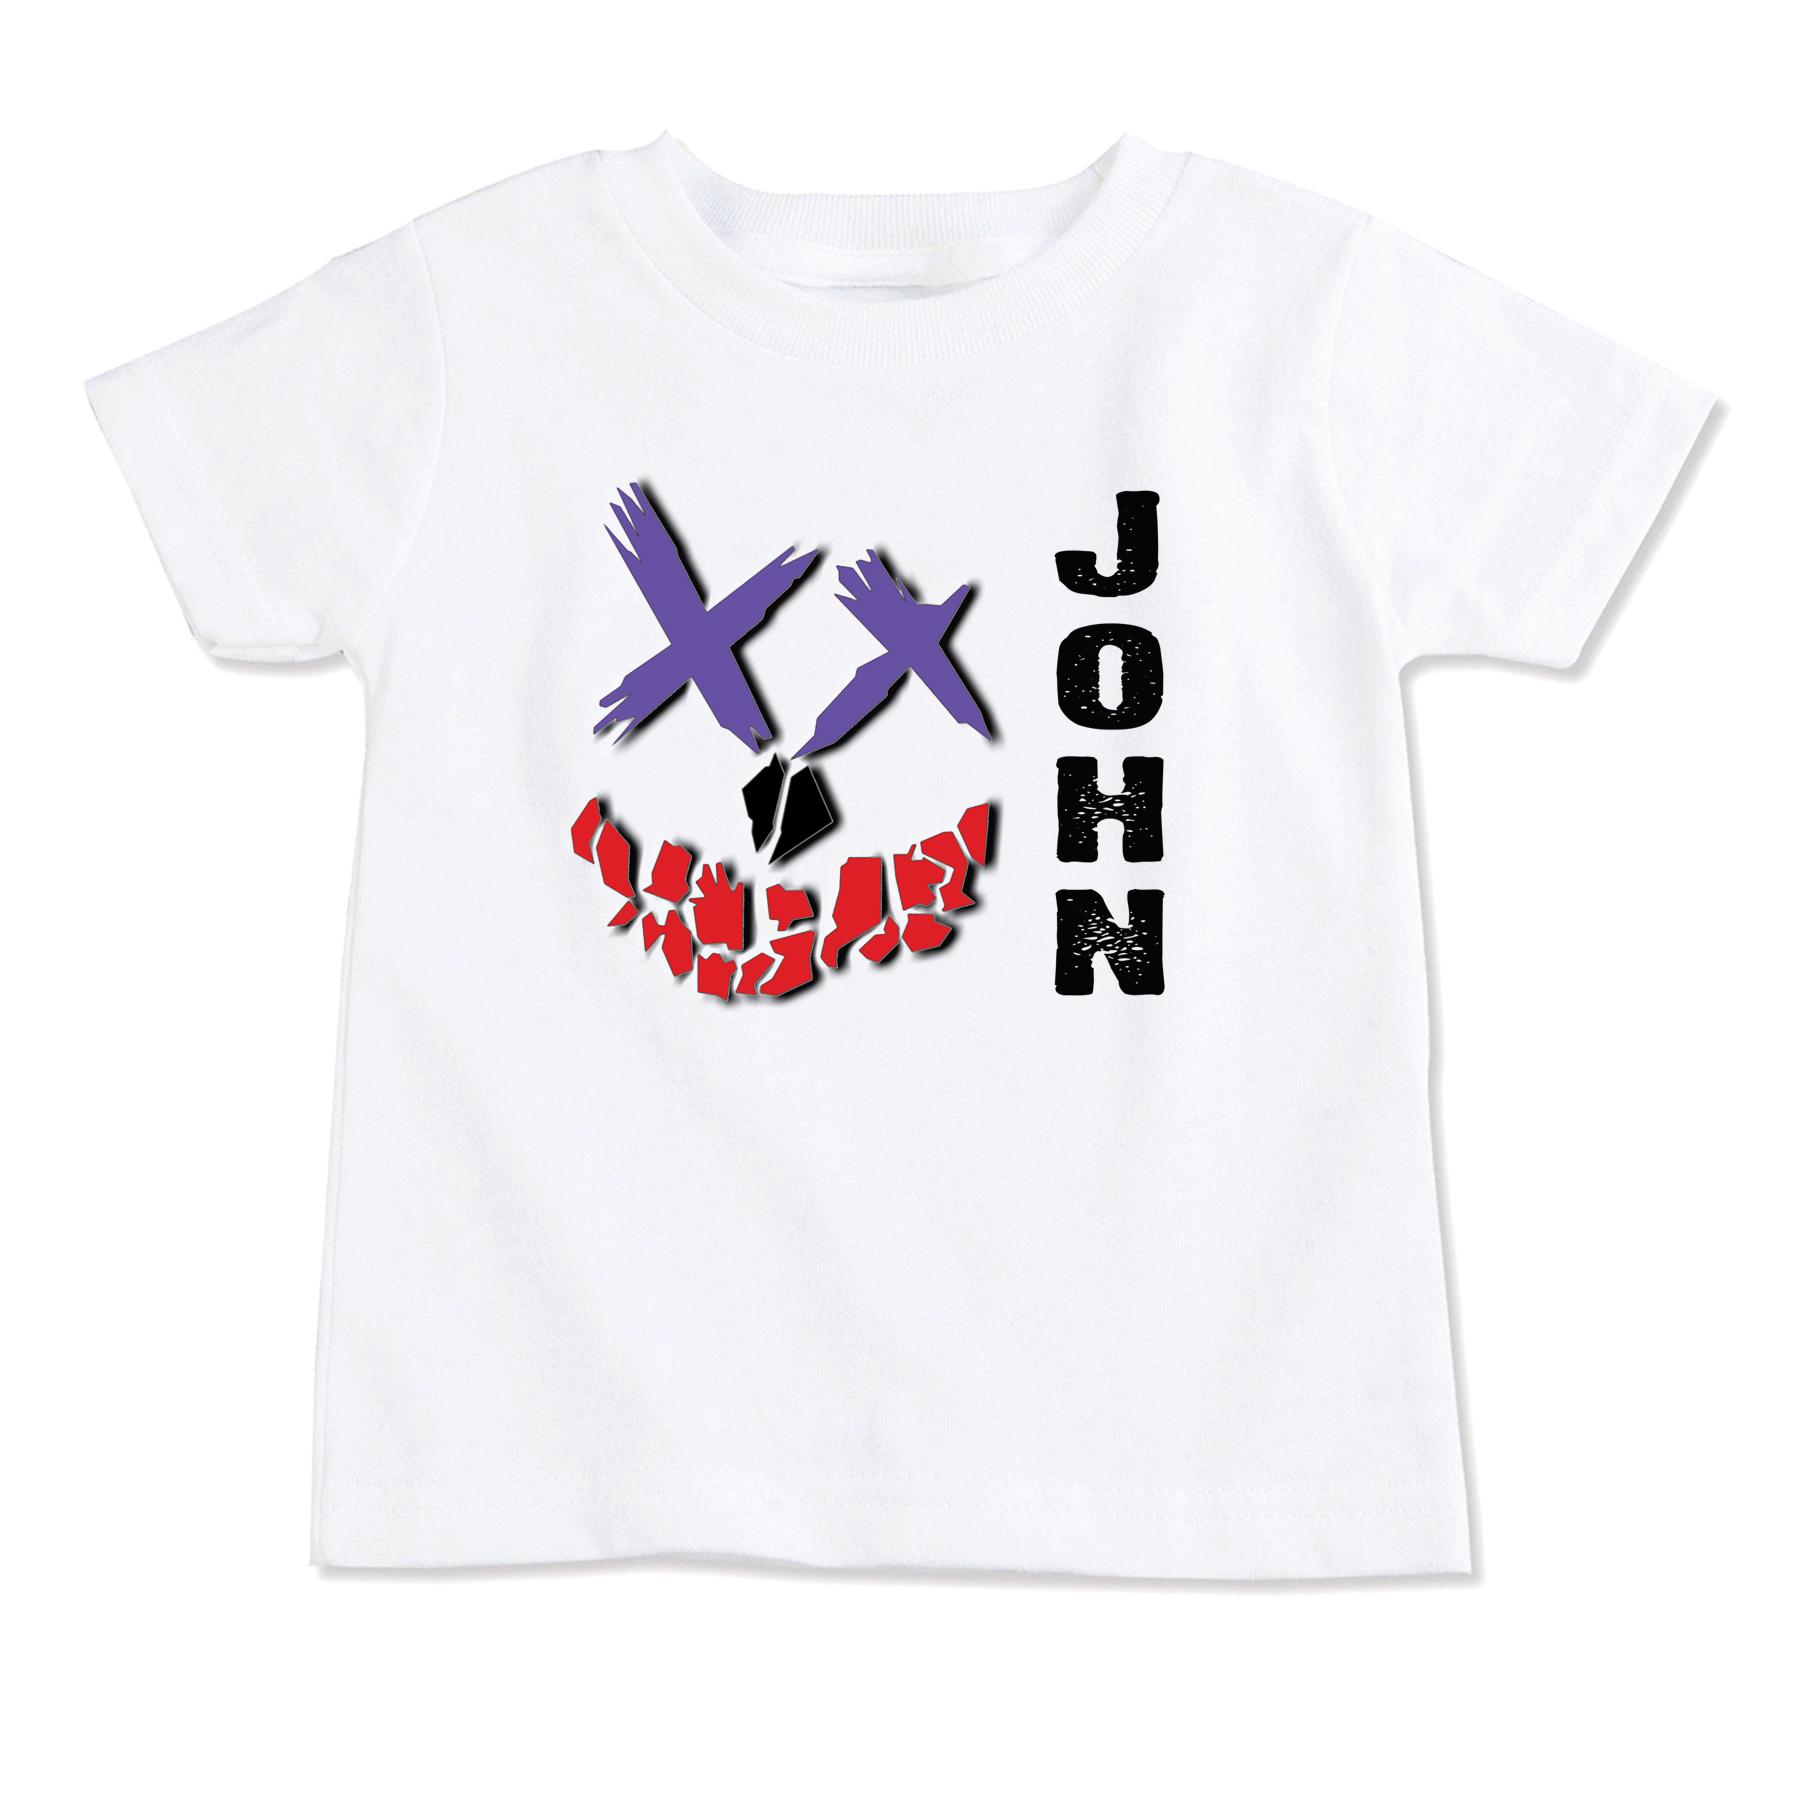 Suicide Squad T-Shirt, Birthday T-Shirt, T-Shirt Top